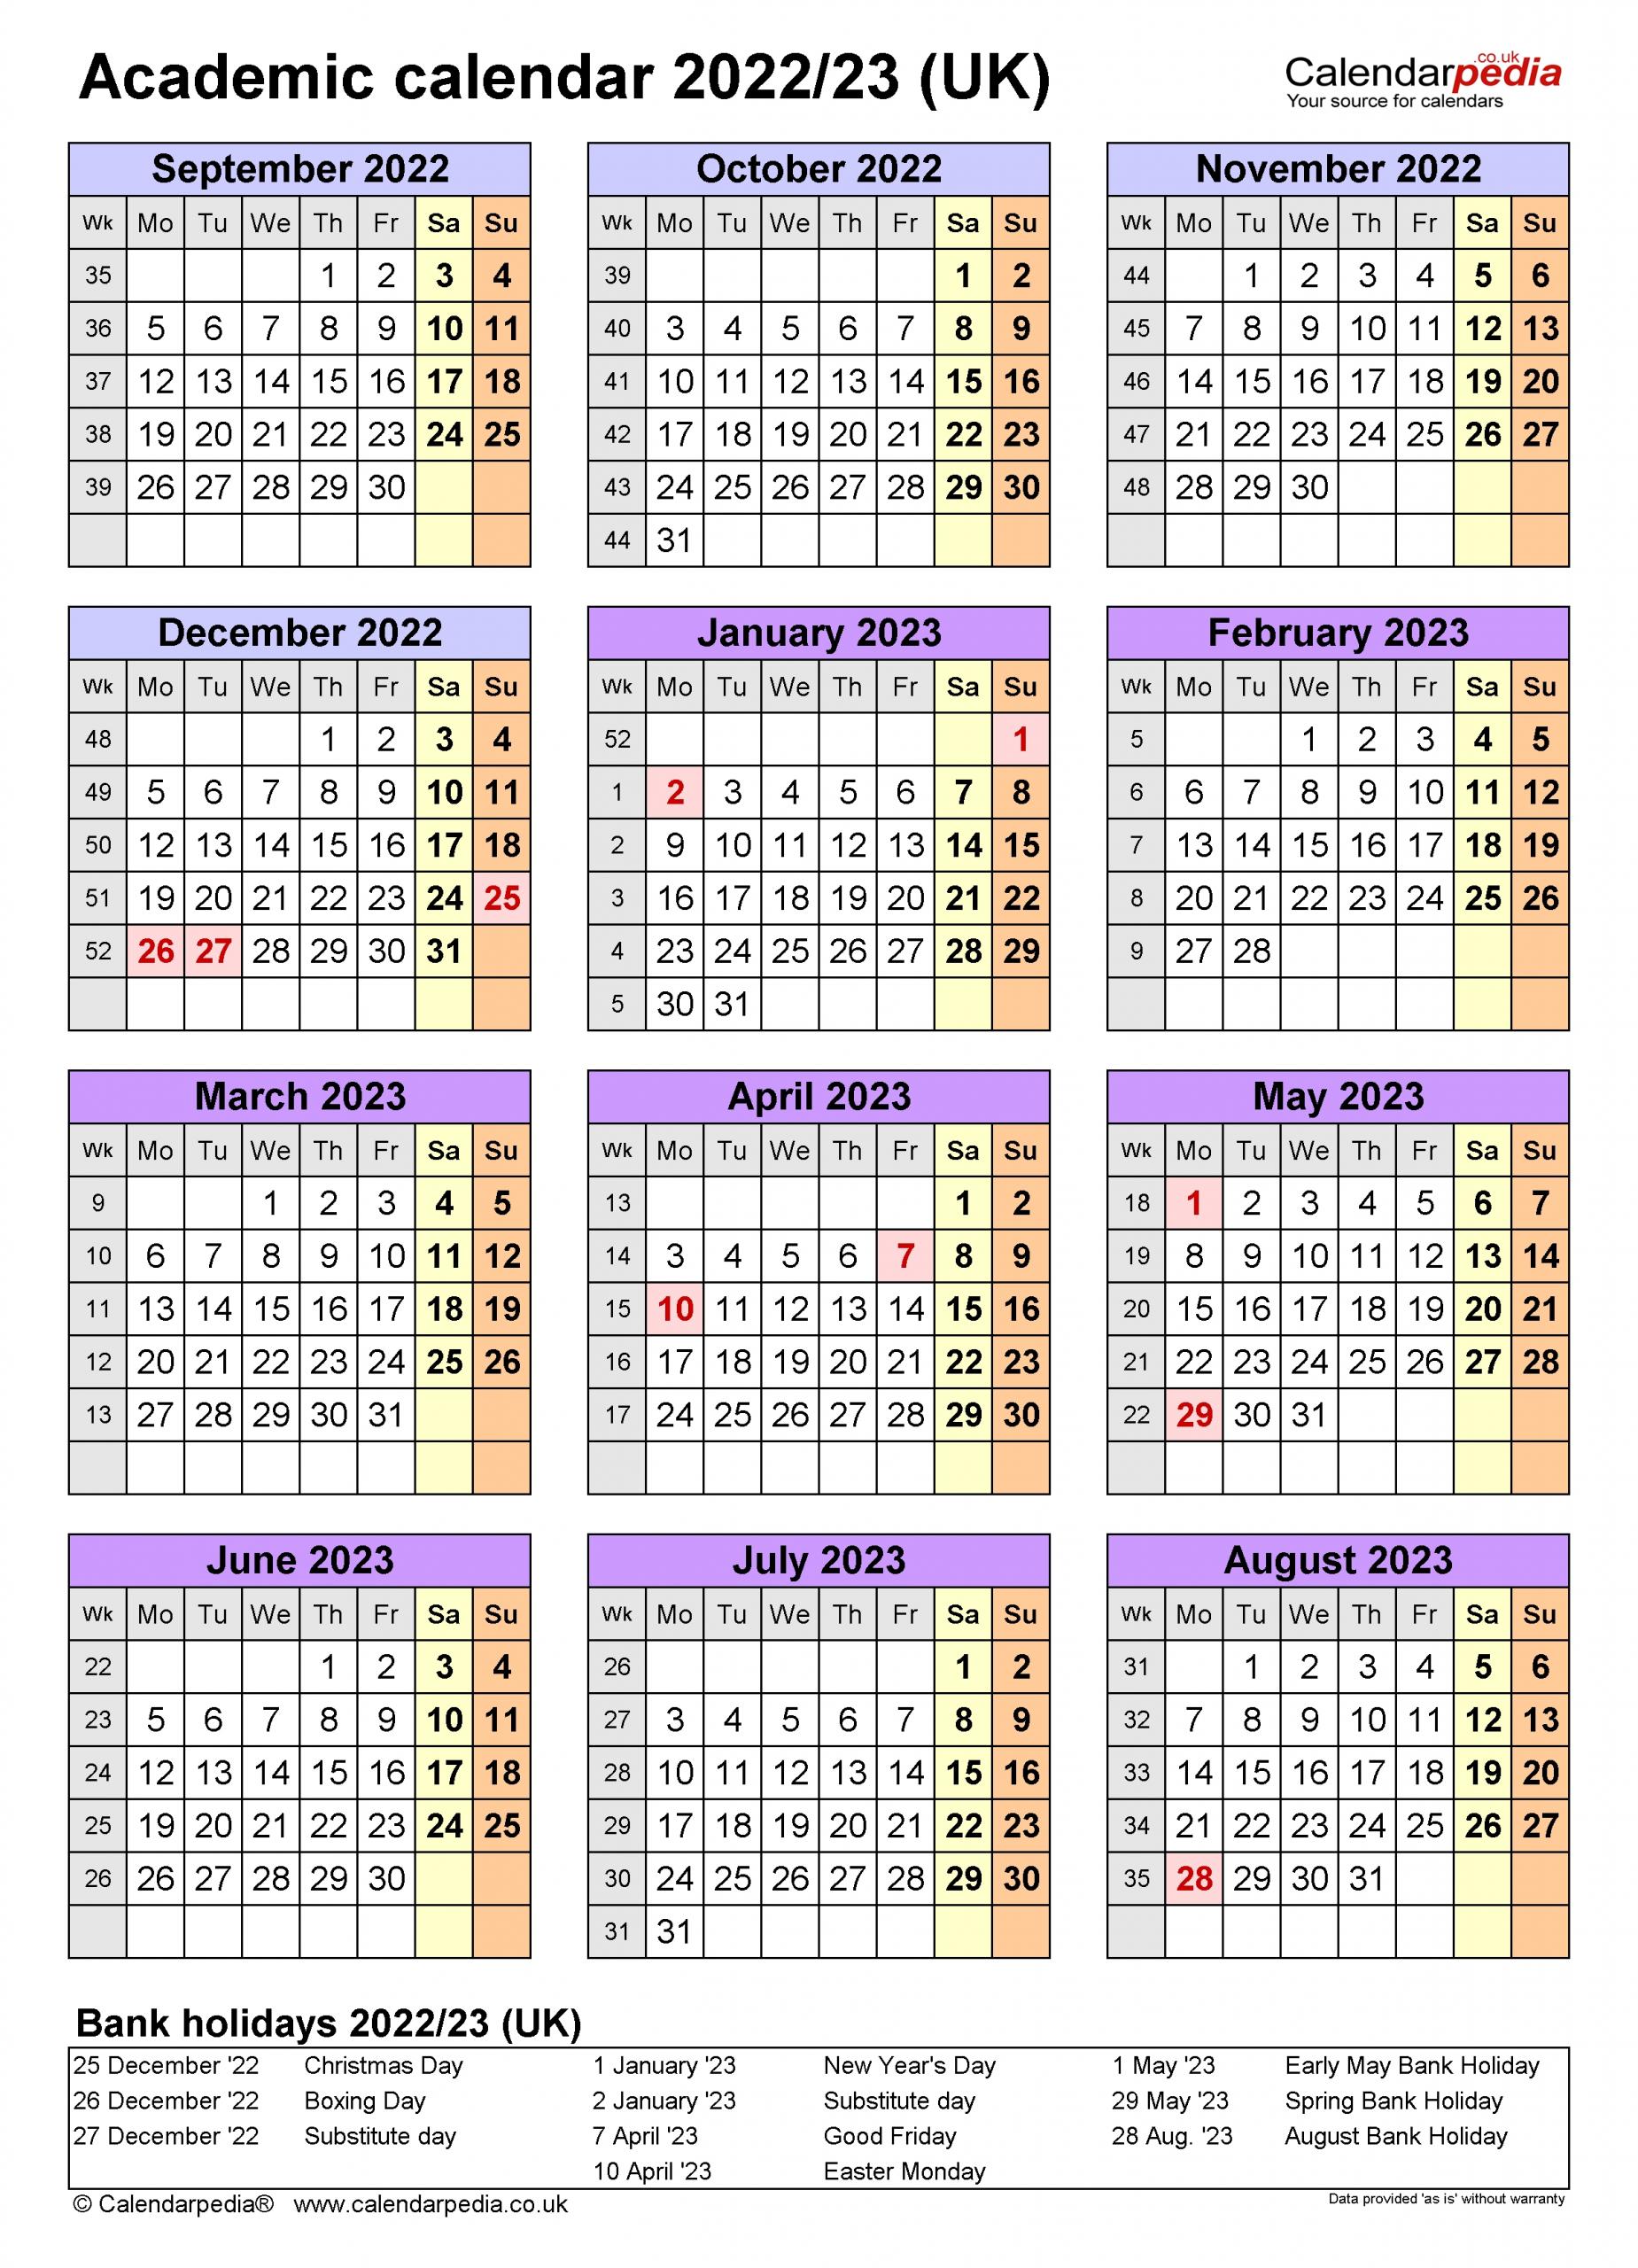 Academic Calendars 2022/23 Uk - Free Printable Excel Templates